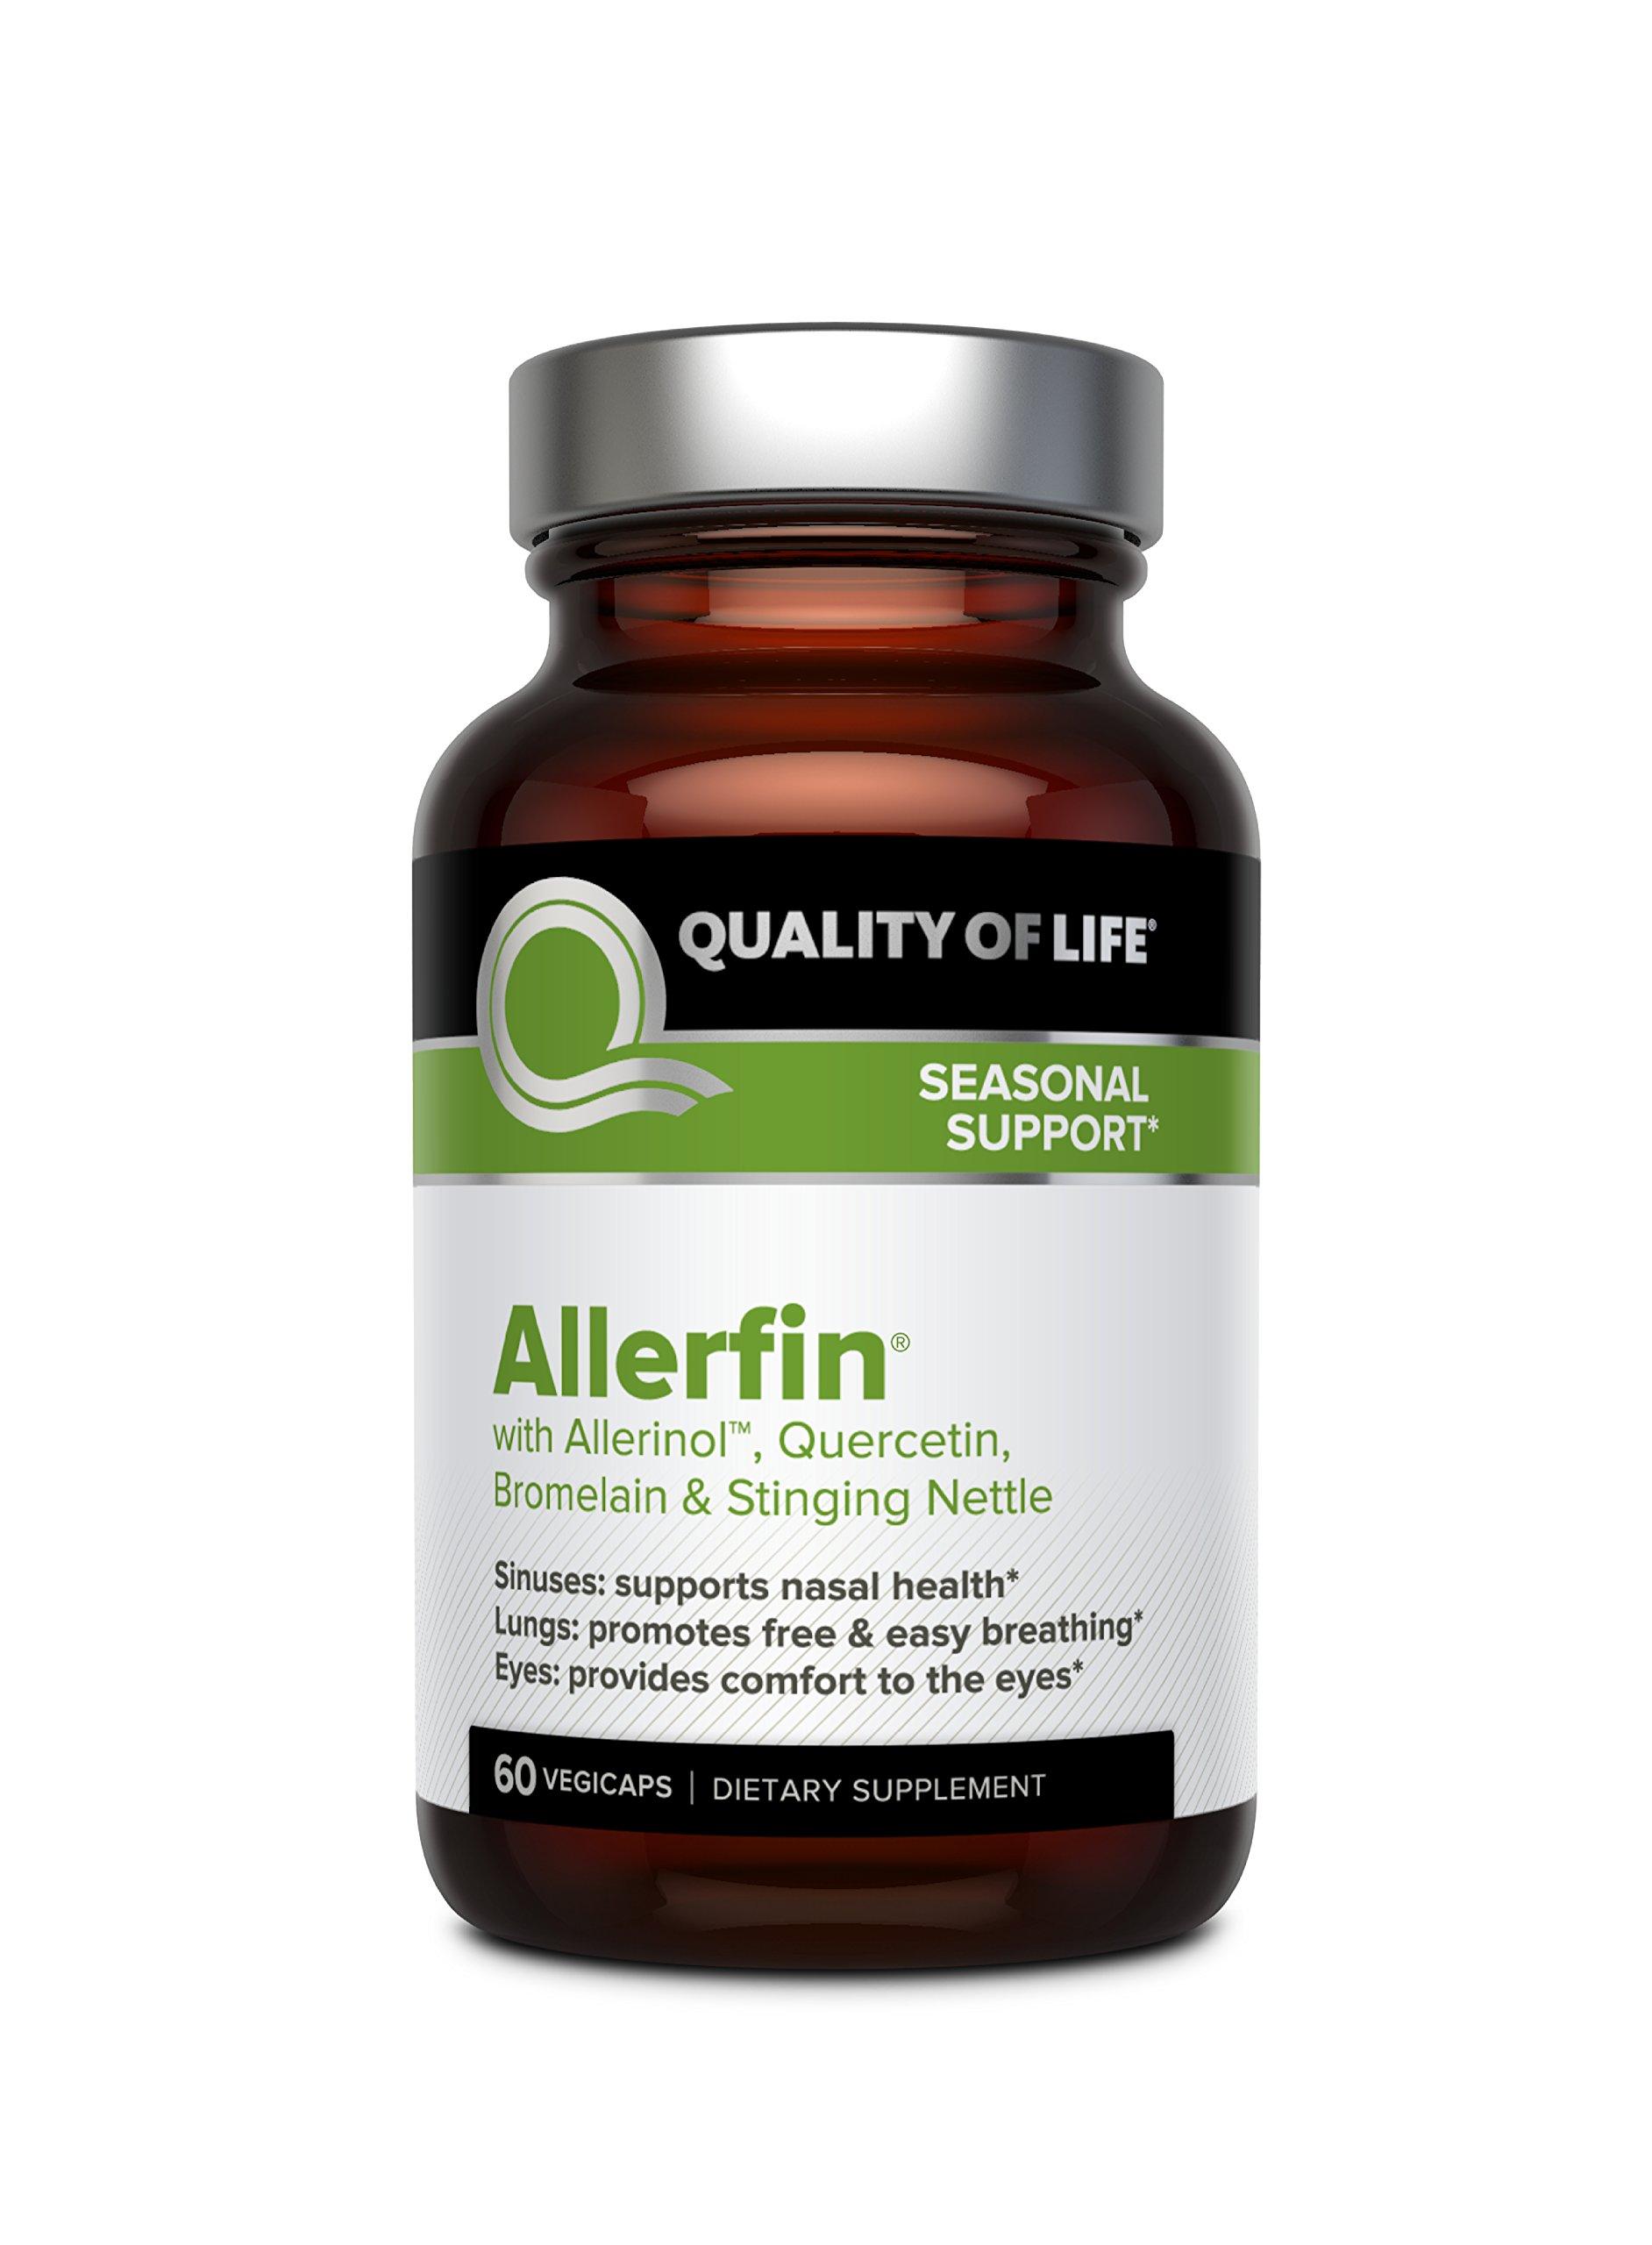 Premium Sinus Relief Supplement – Helps Support Sinus, Nasal, Lung, Seasonal & Allergy Relief - Includes Bromelain, Quercetin, Stinging Nettle & Allerinol – 60 Vegetable Capsules